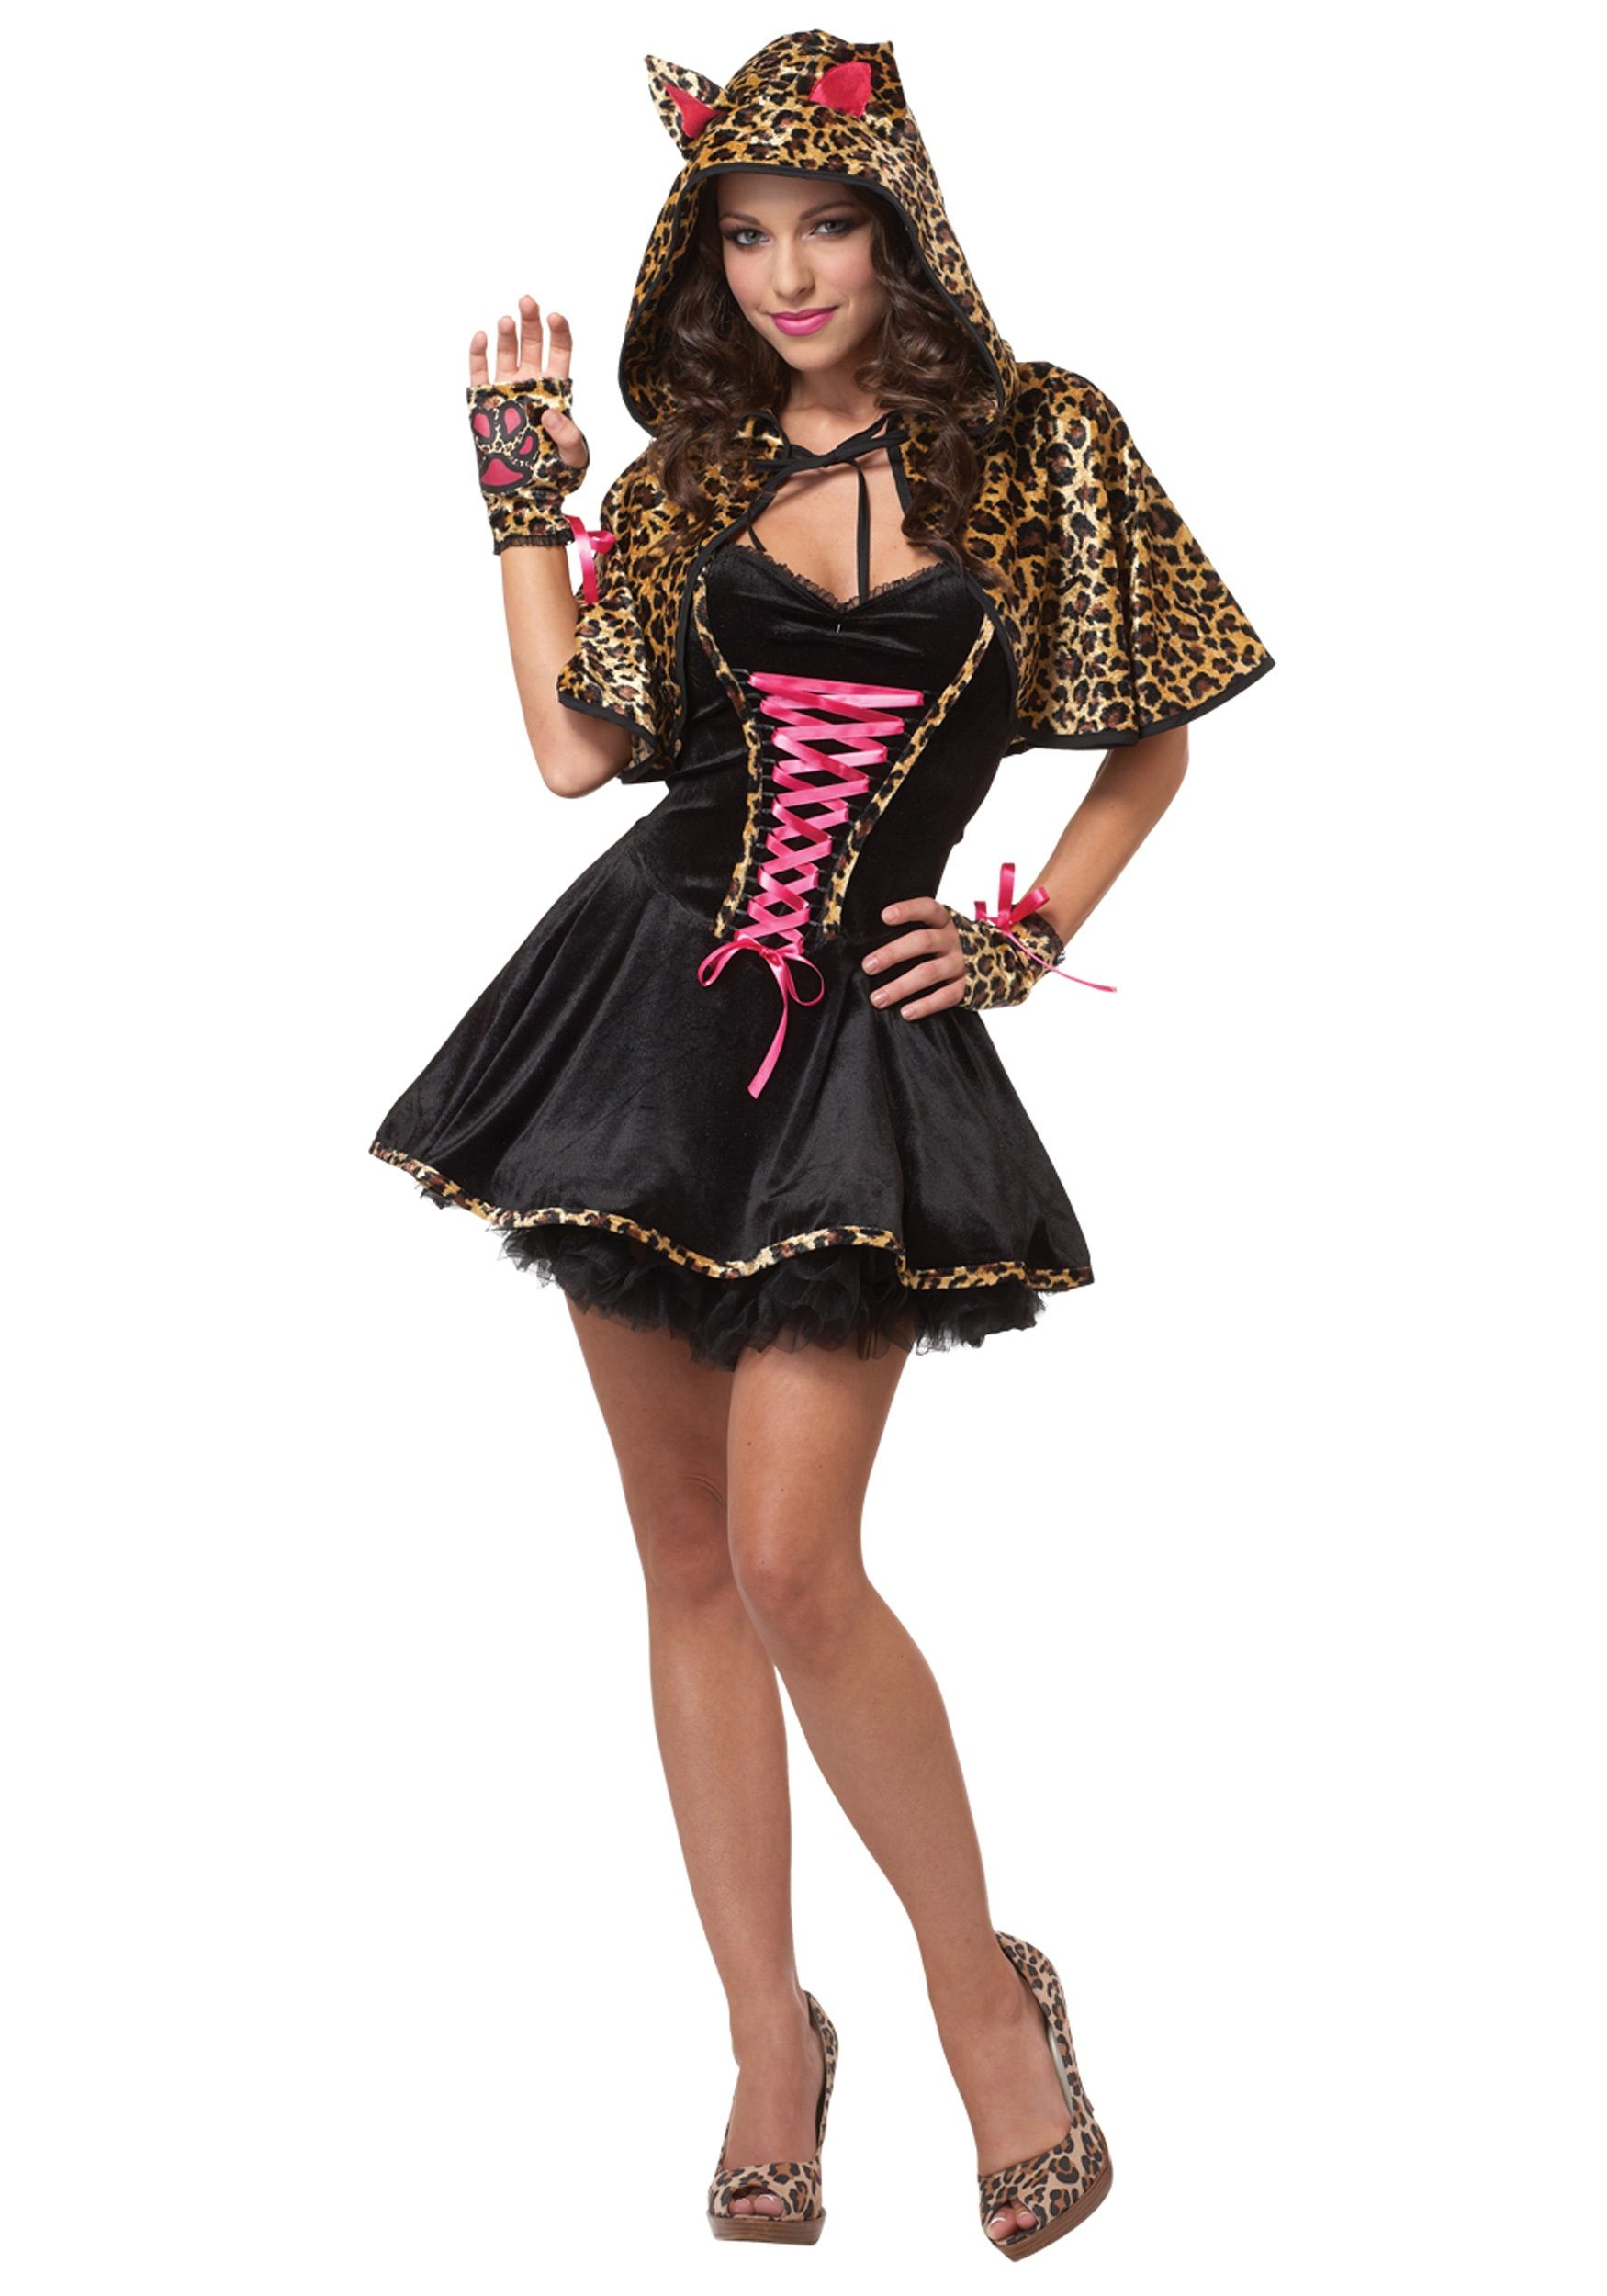 Teen Halloween Costumes Teenage Girls | Halloween Costumes ...